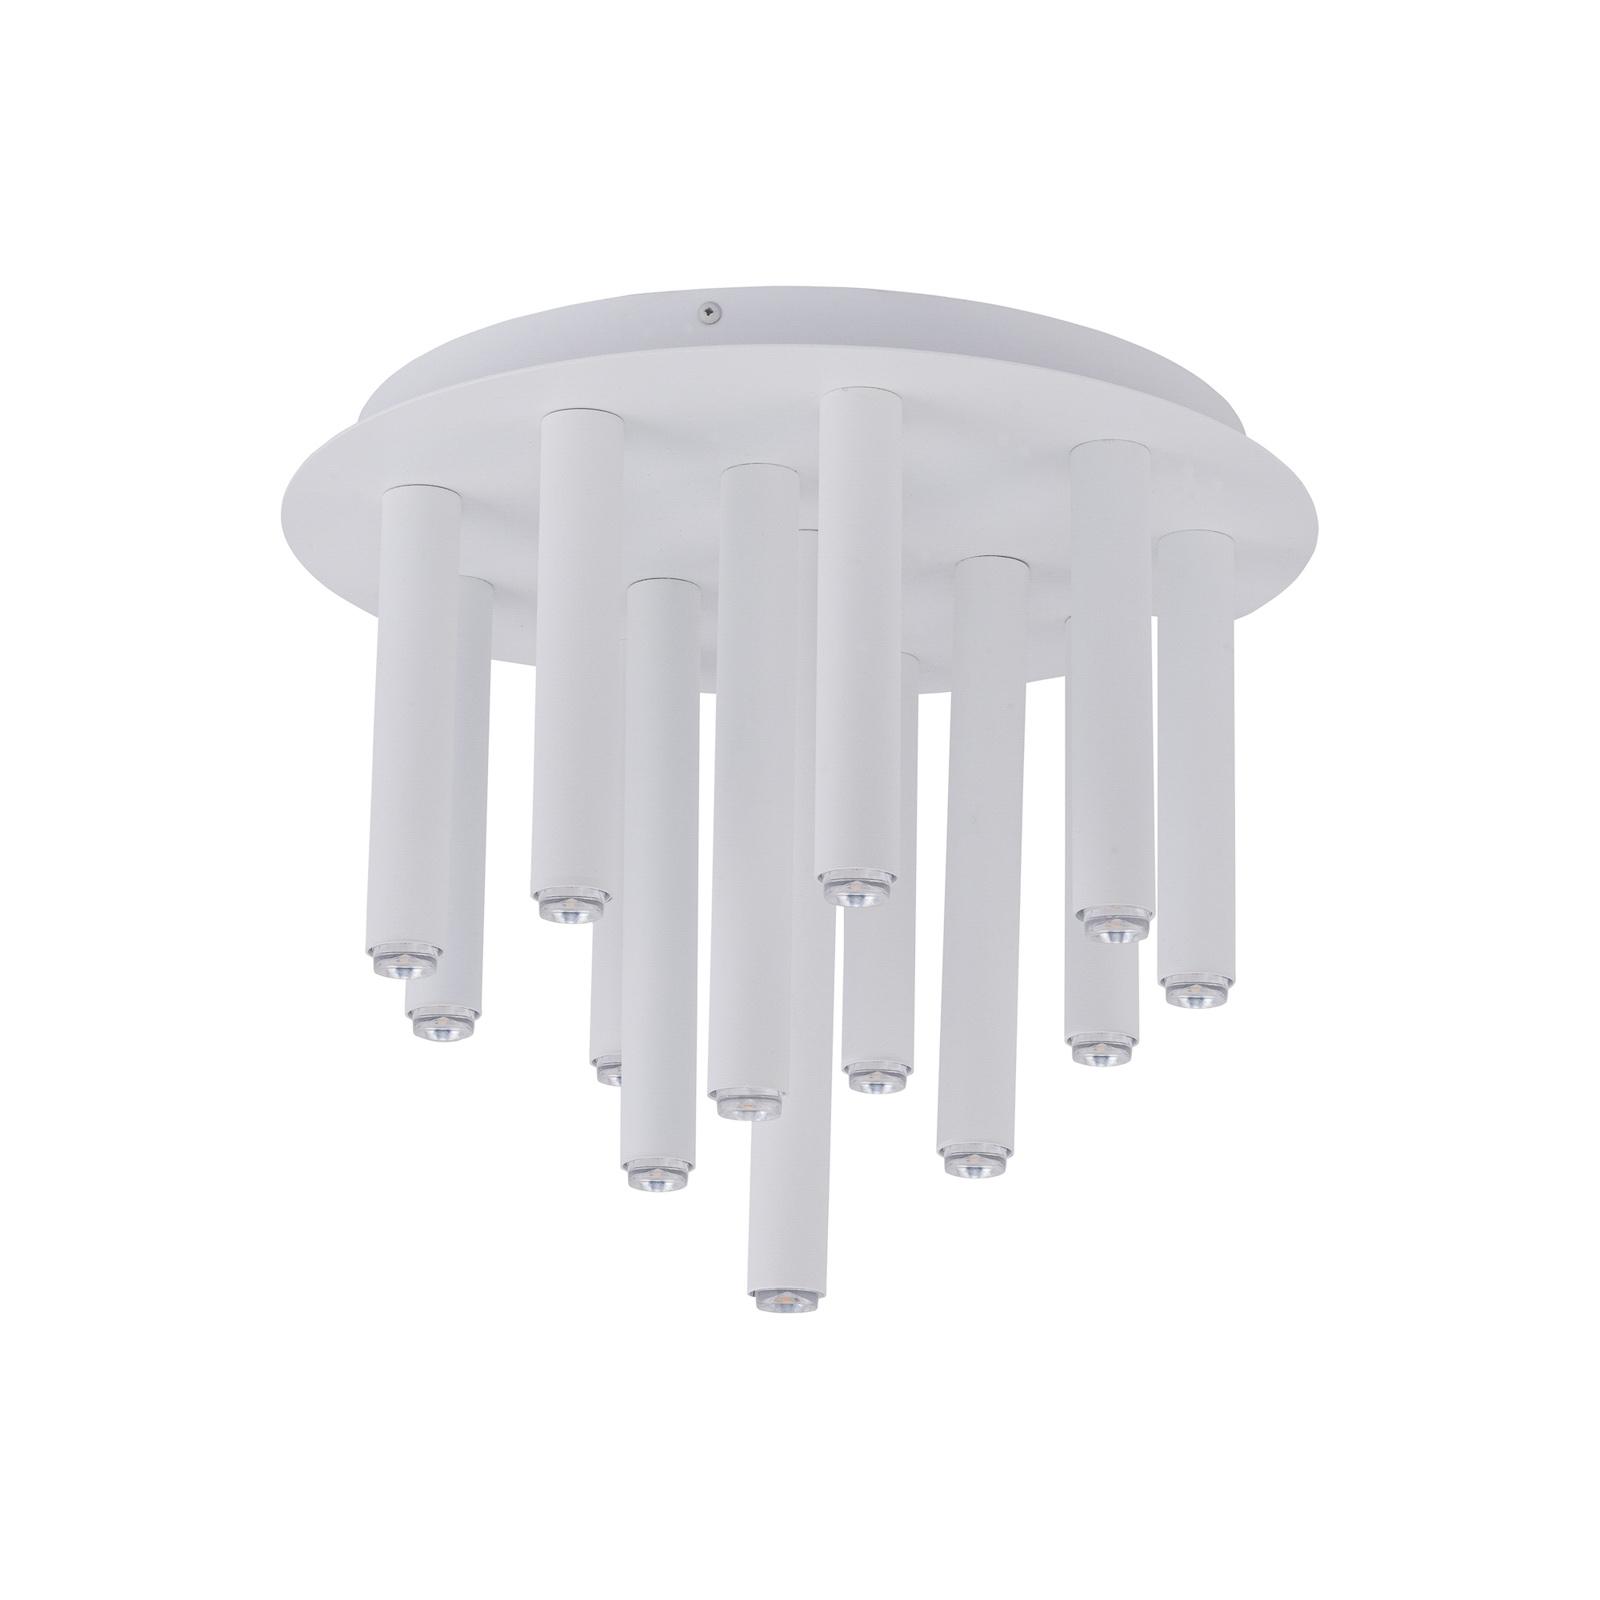 Taklampe Stalactite 13 lyskilder, hvit